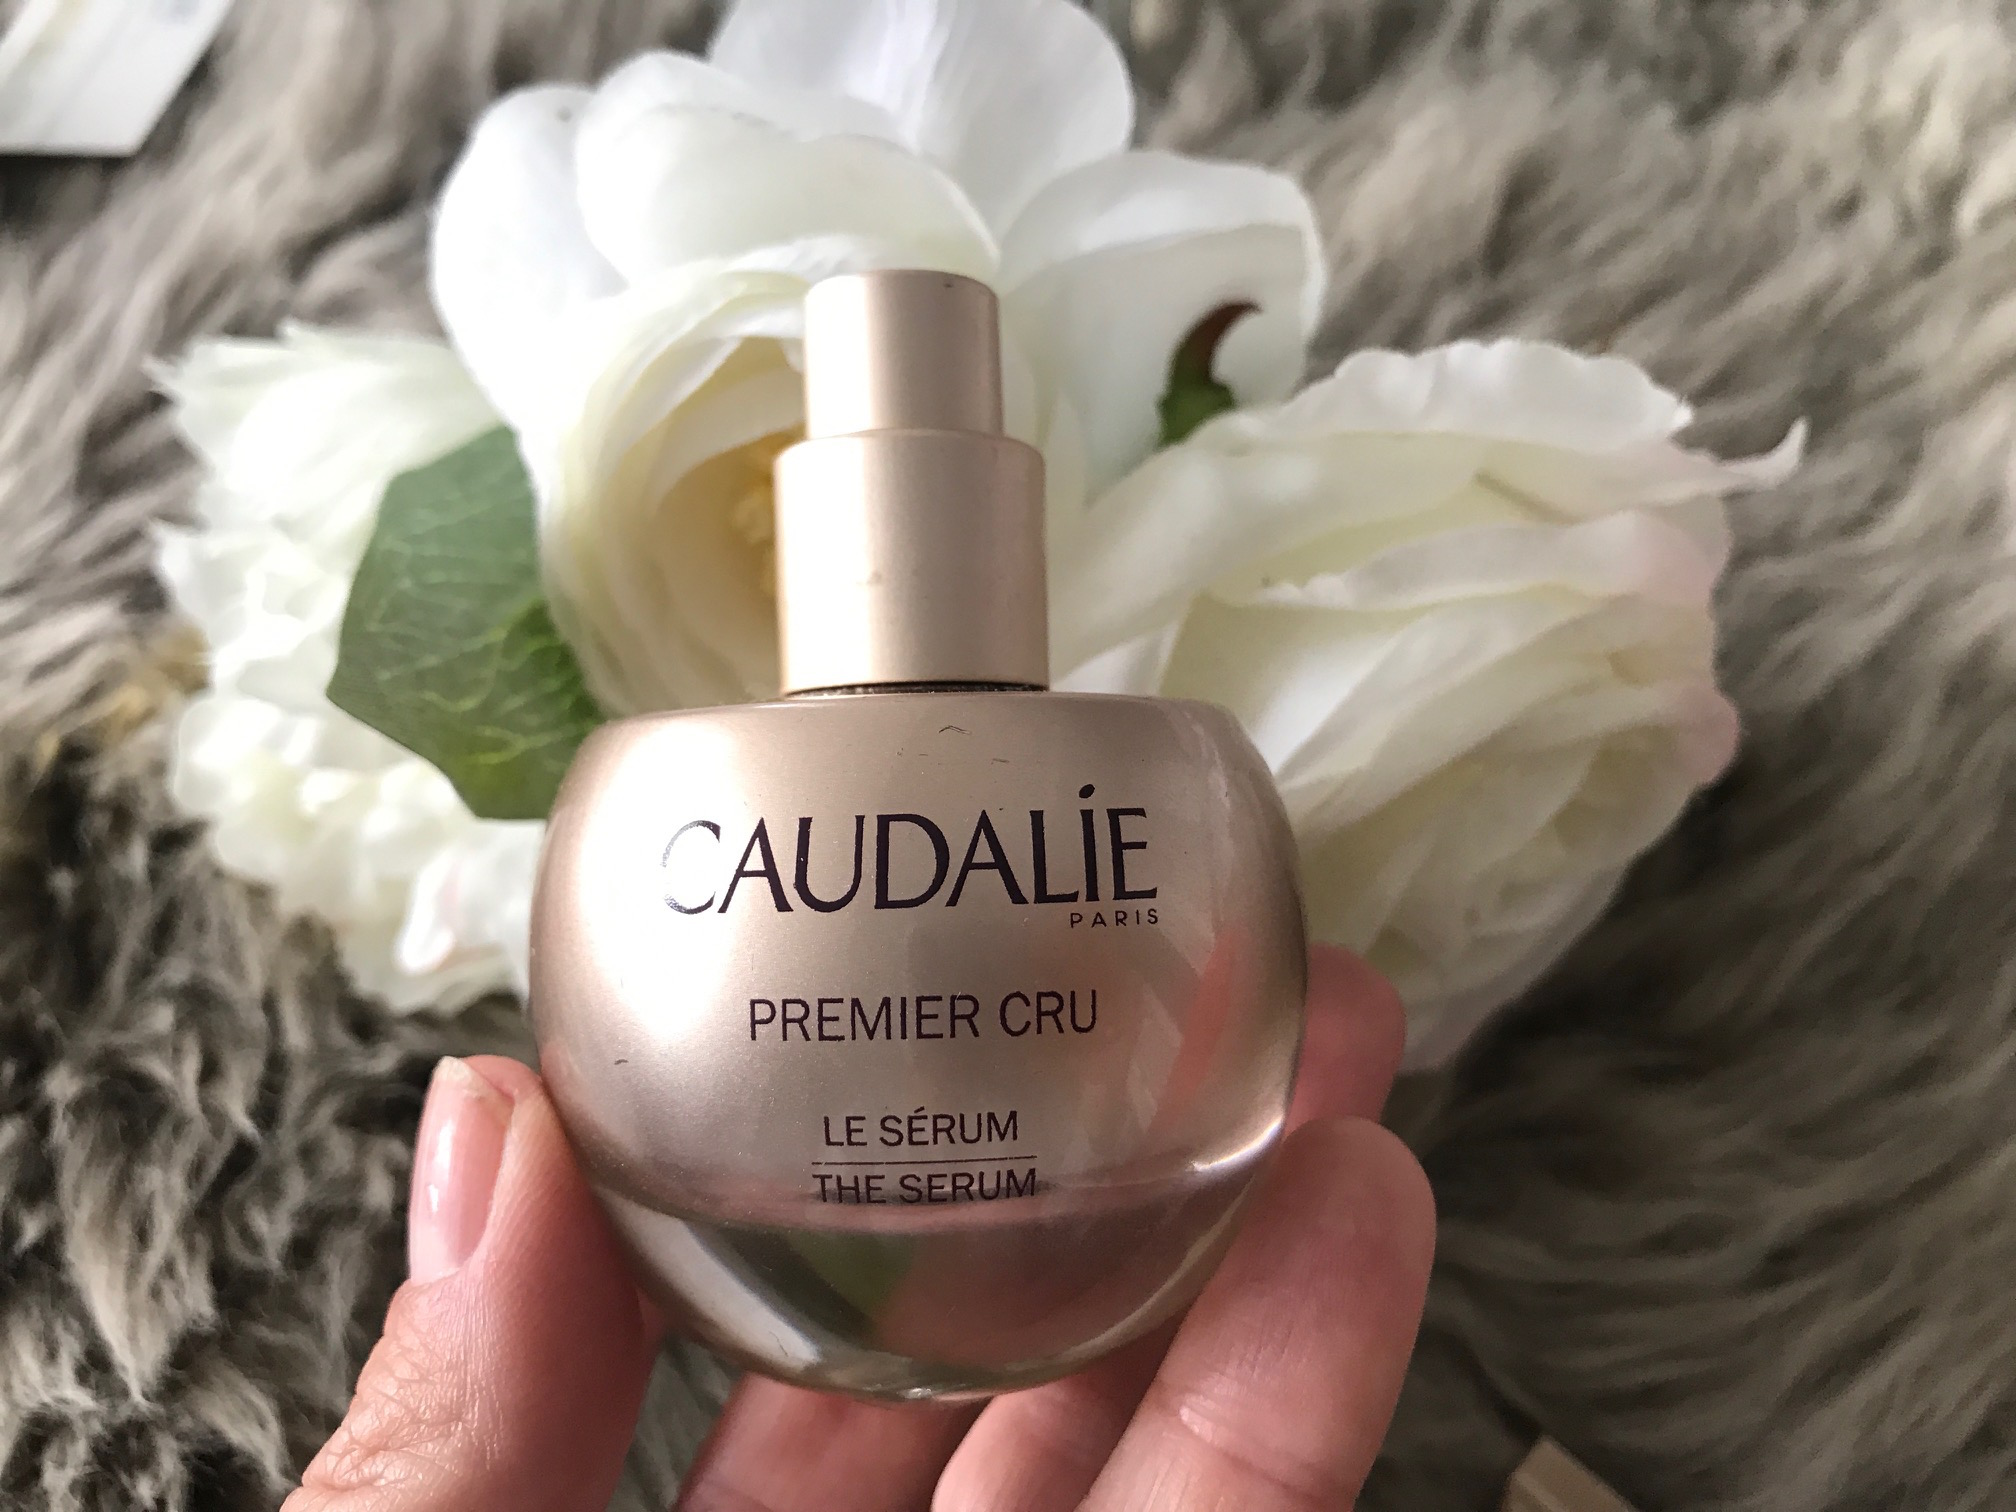 Caudalie_Serum_Skincare